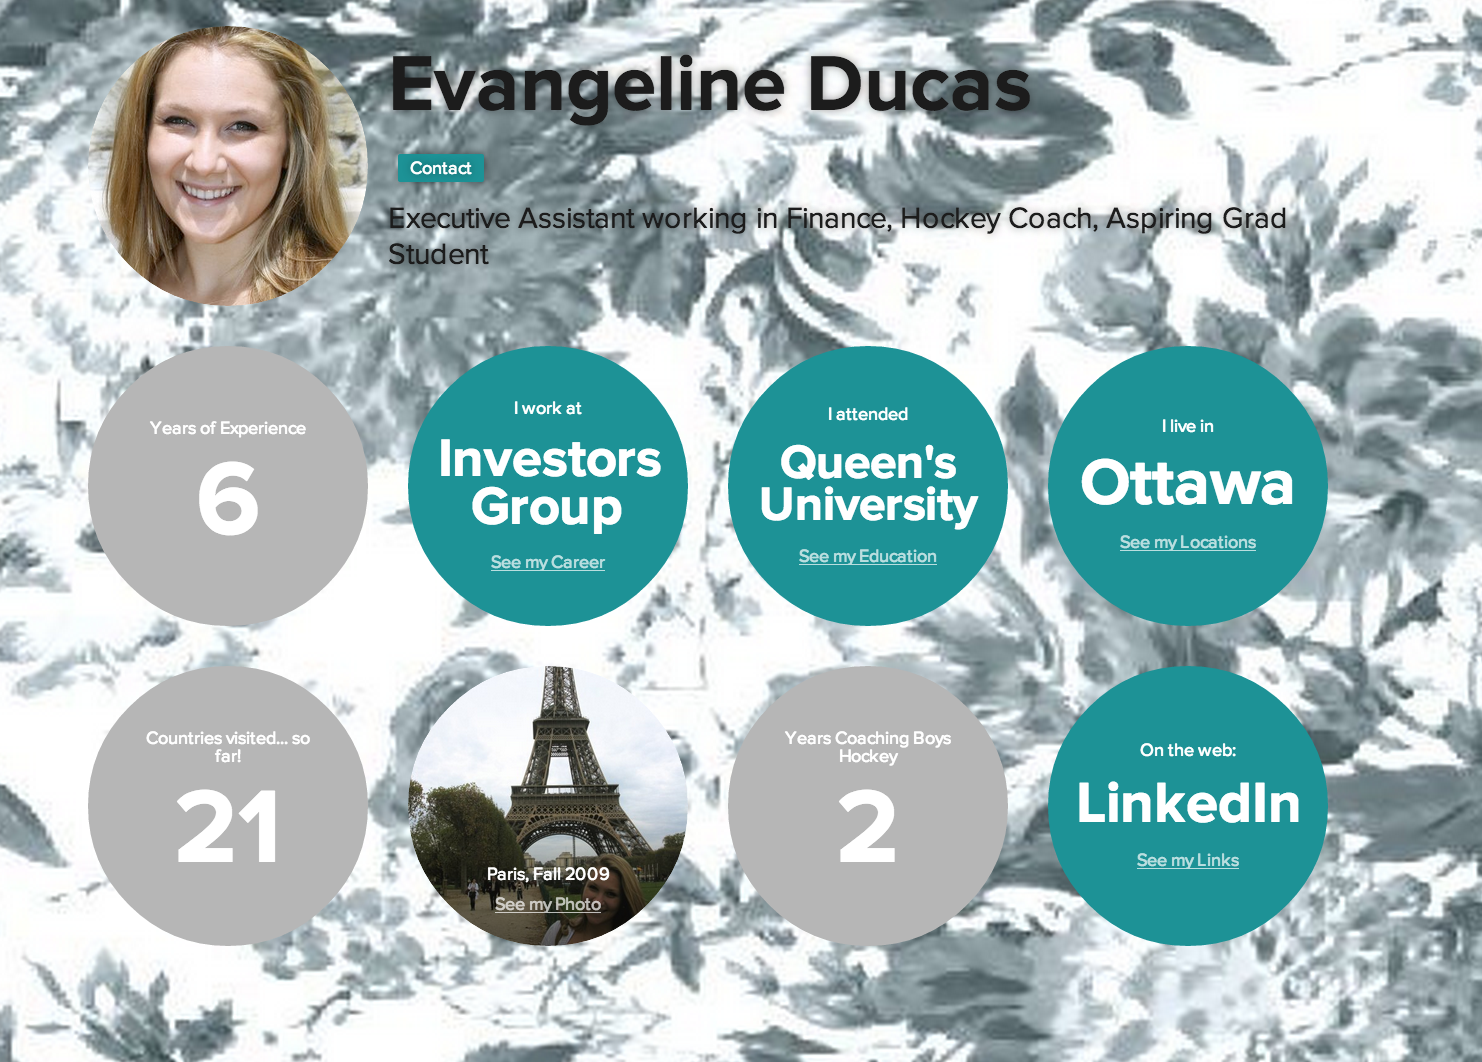 Evangeline's interactive infographic resume Interactive